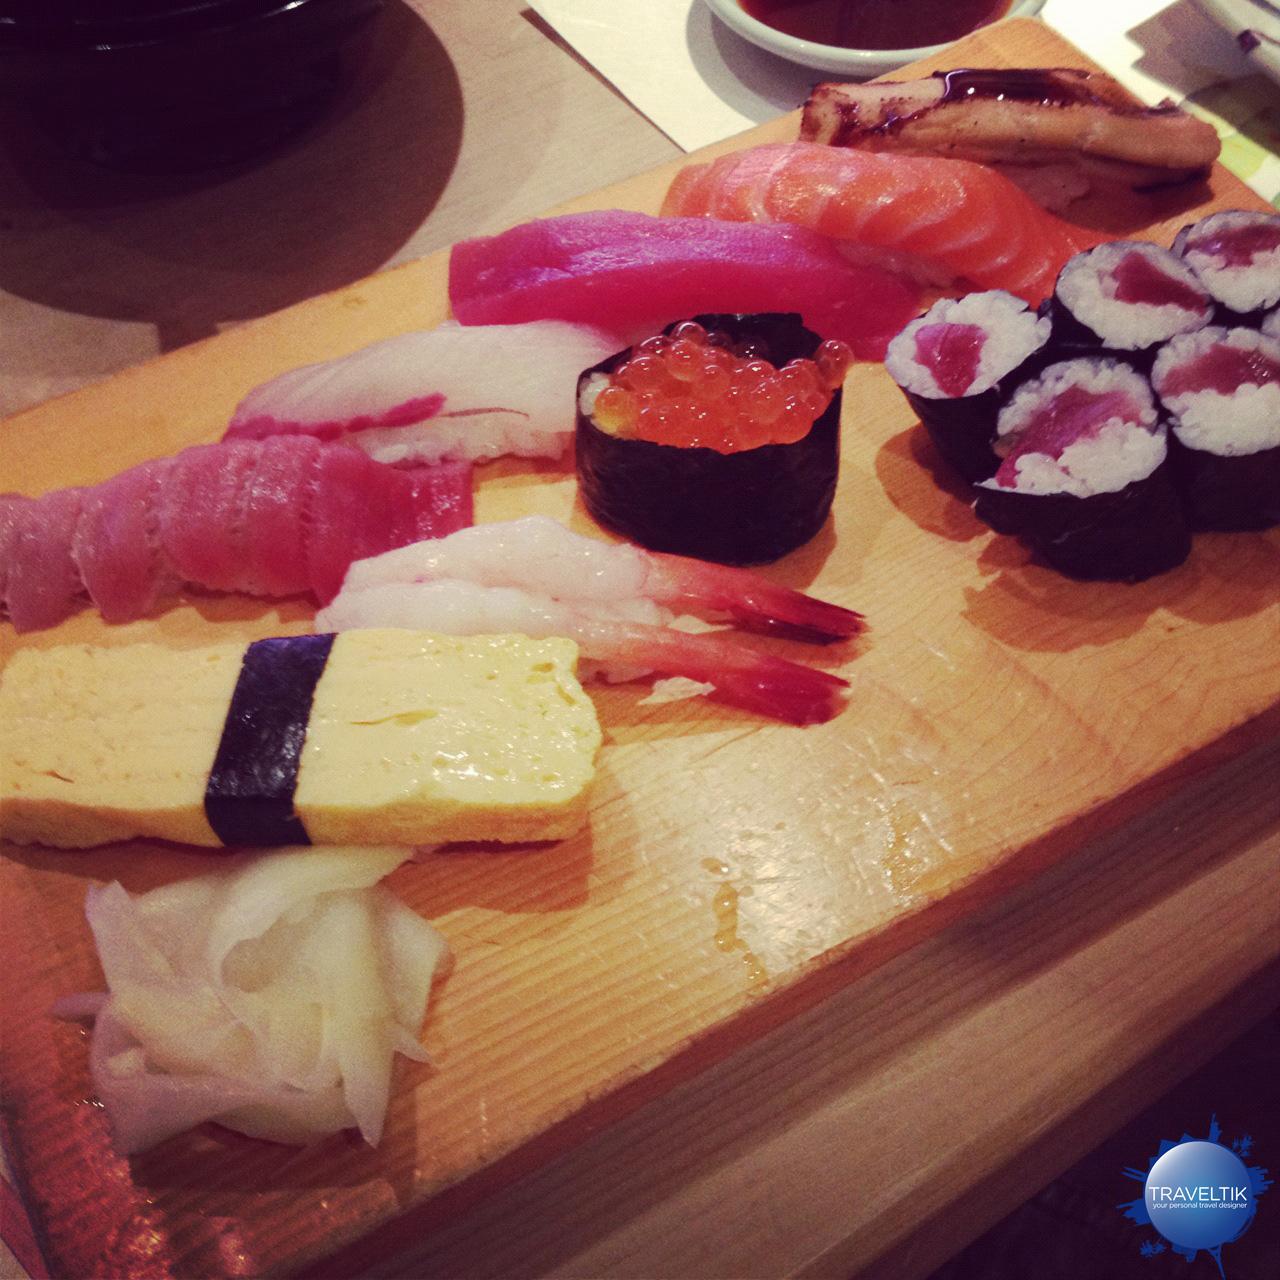 Giappone E Cucina Giapponese Non Solo Sushi Traveltik The Blog